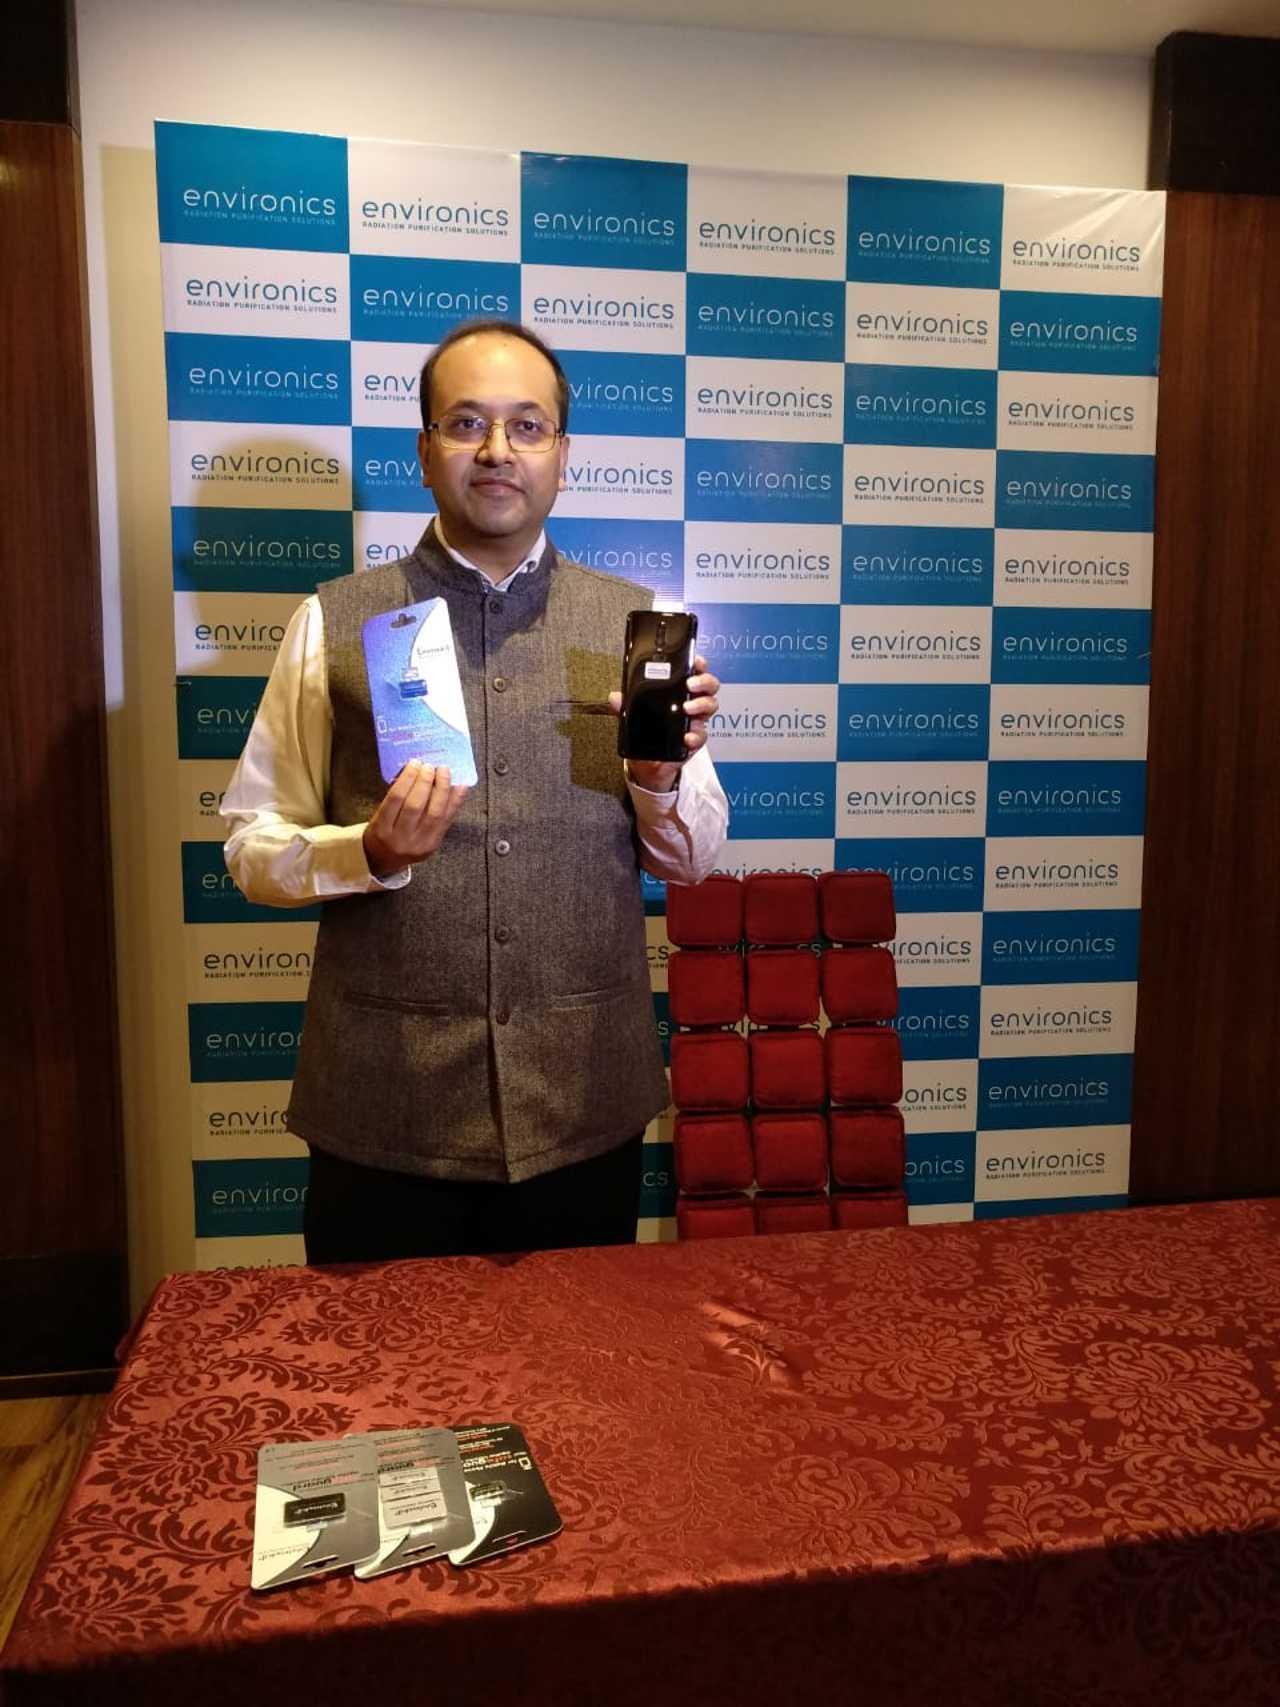 Mr. Pranav Poddar, Director, Syenergy Environics Limited, launching Envirochip in Jaipur